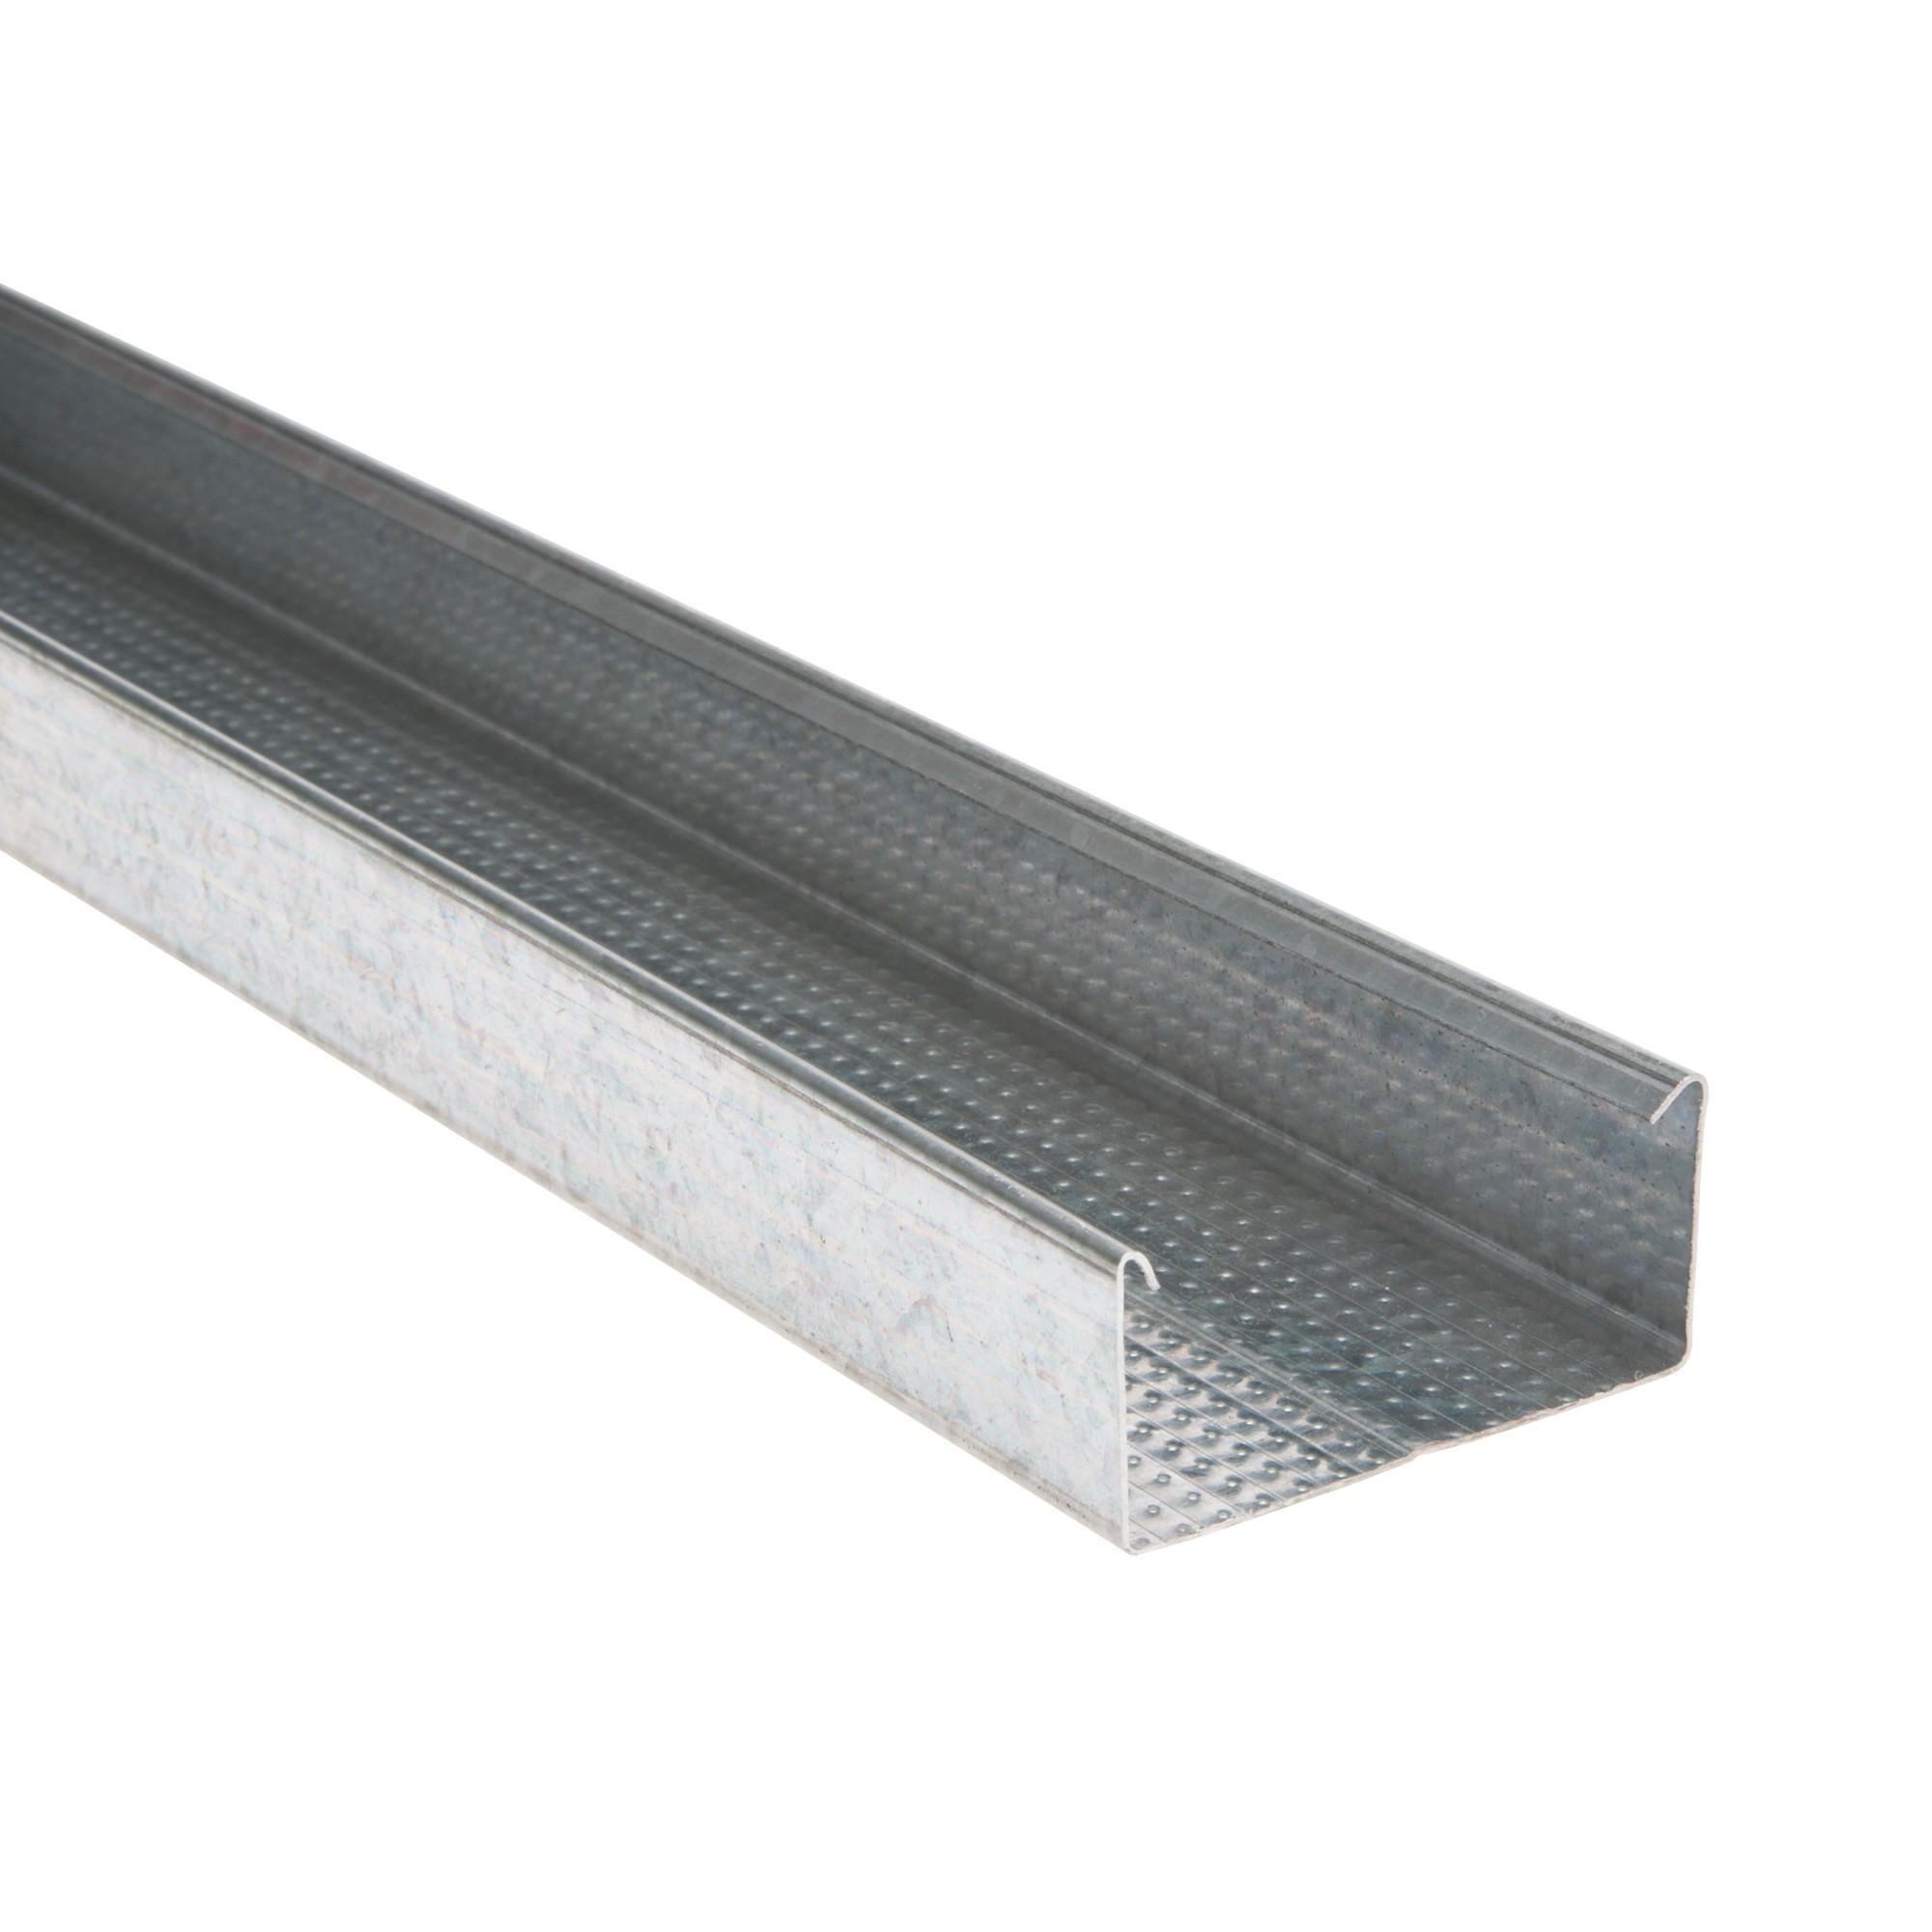 Favoriete Metal stud plafond basis II | Systeemplafond.nu DO63